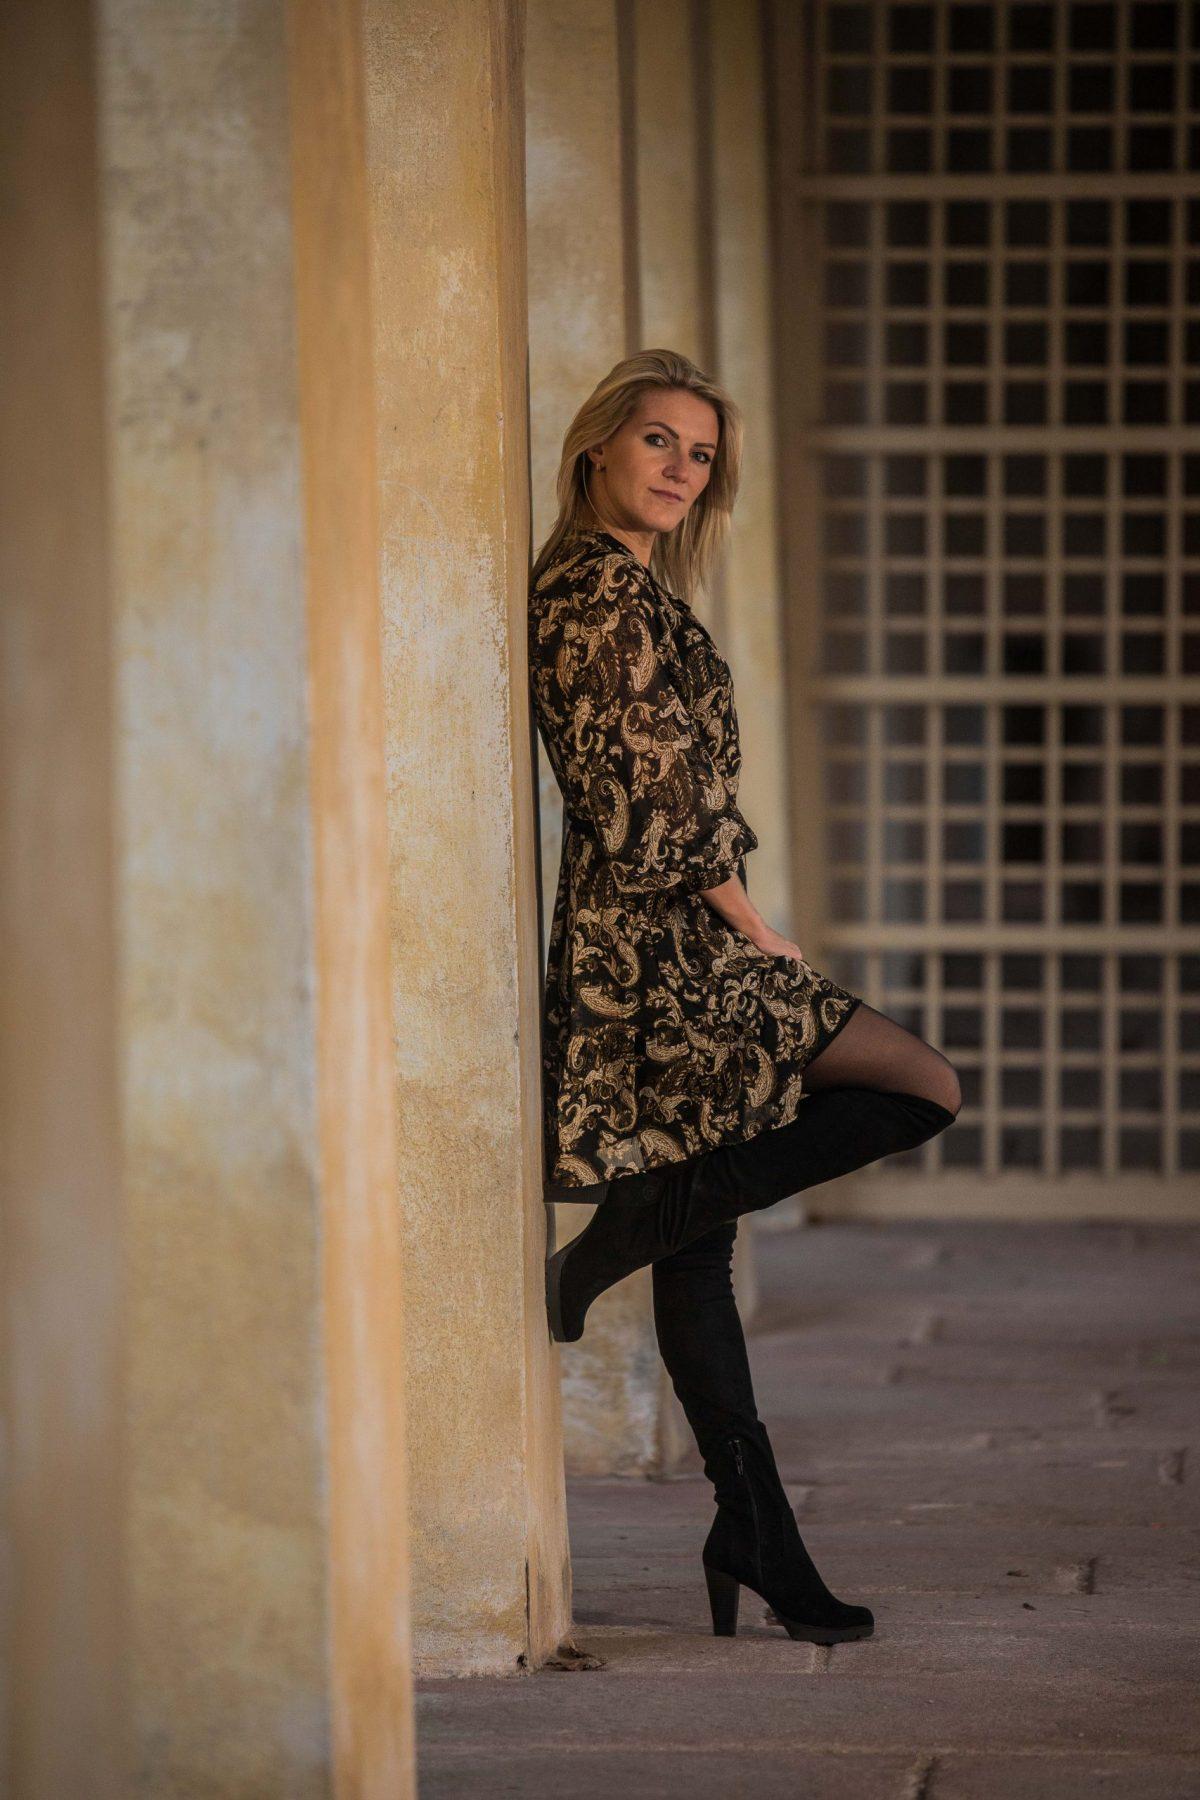 mtubach Photografie | Portraitshooting Lena